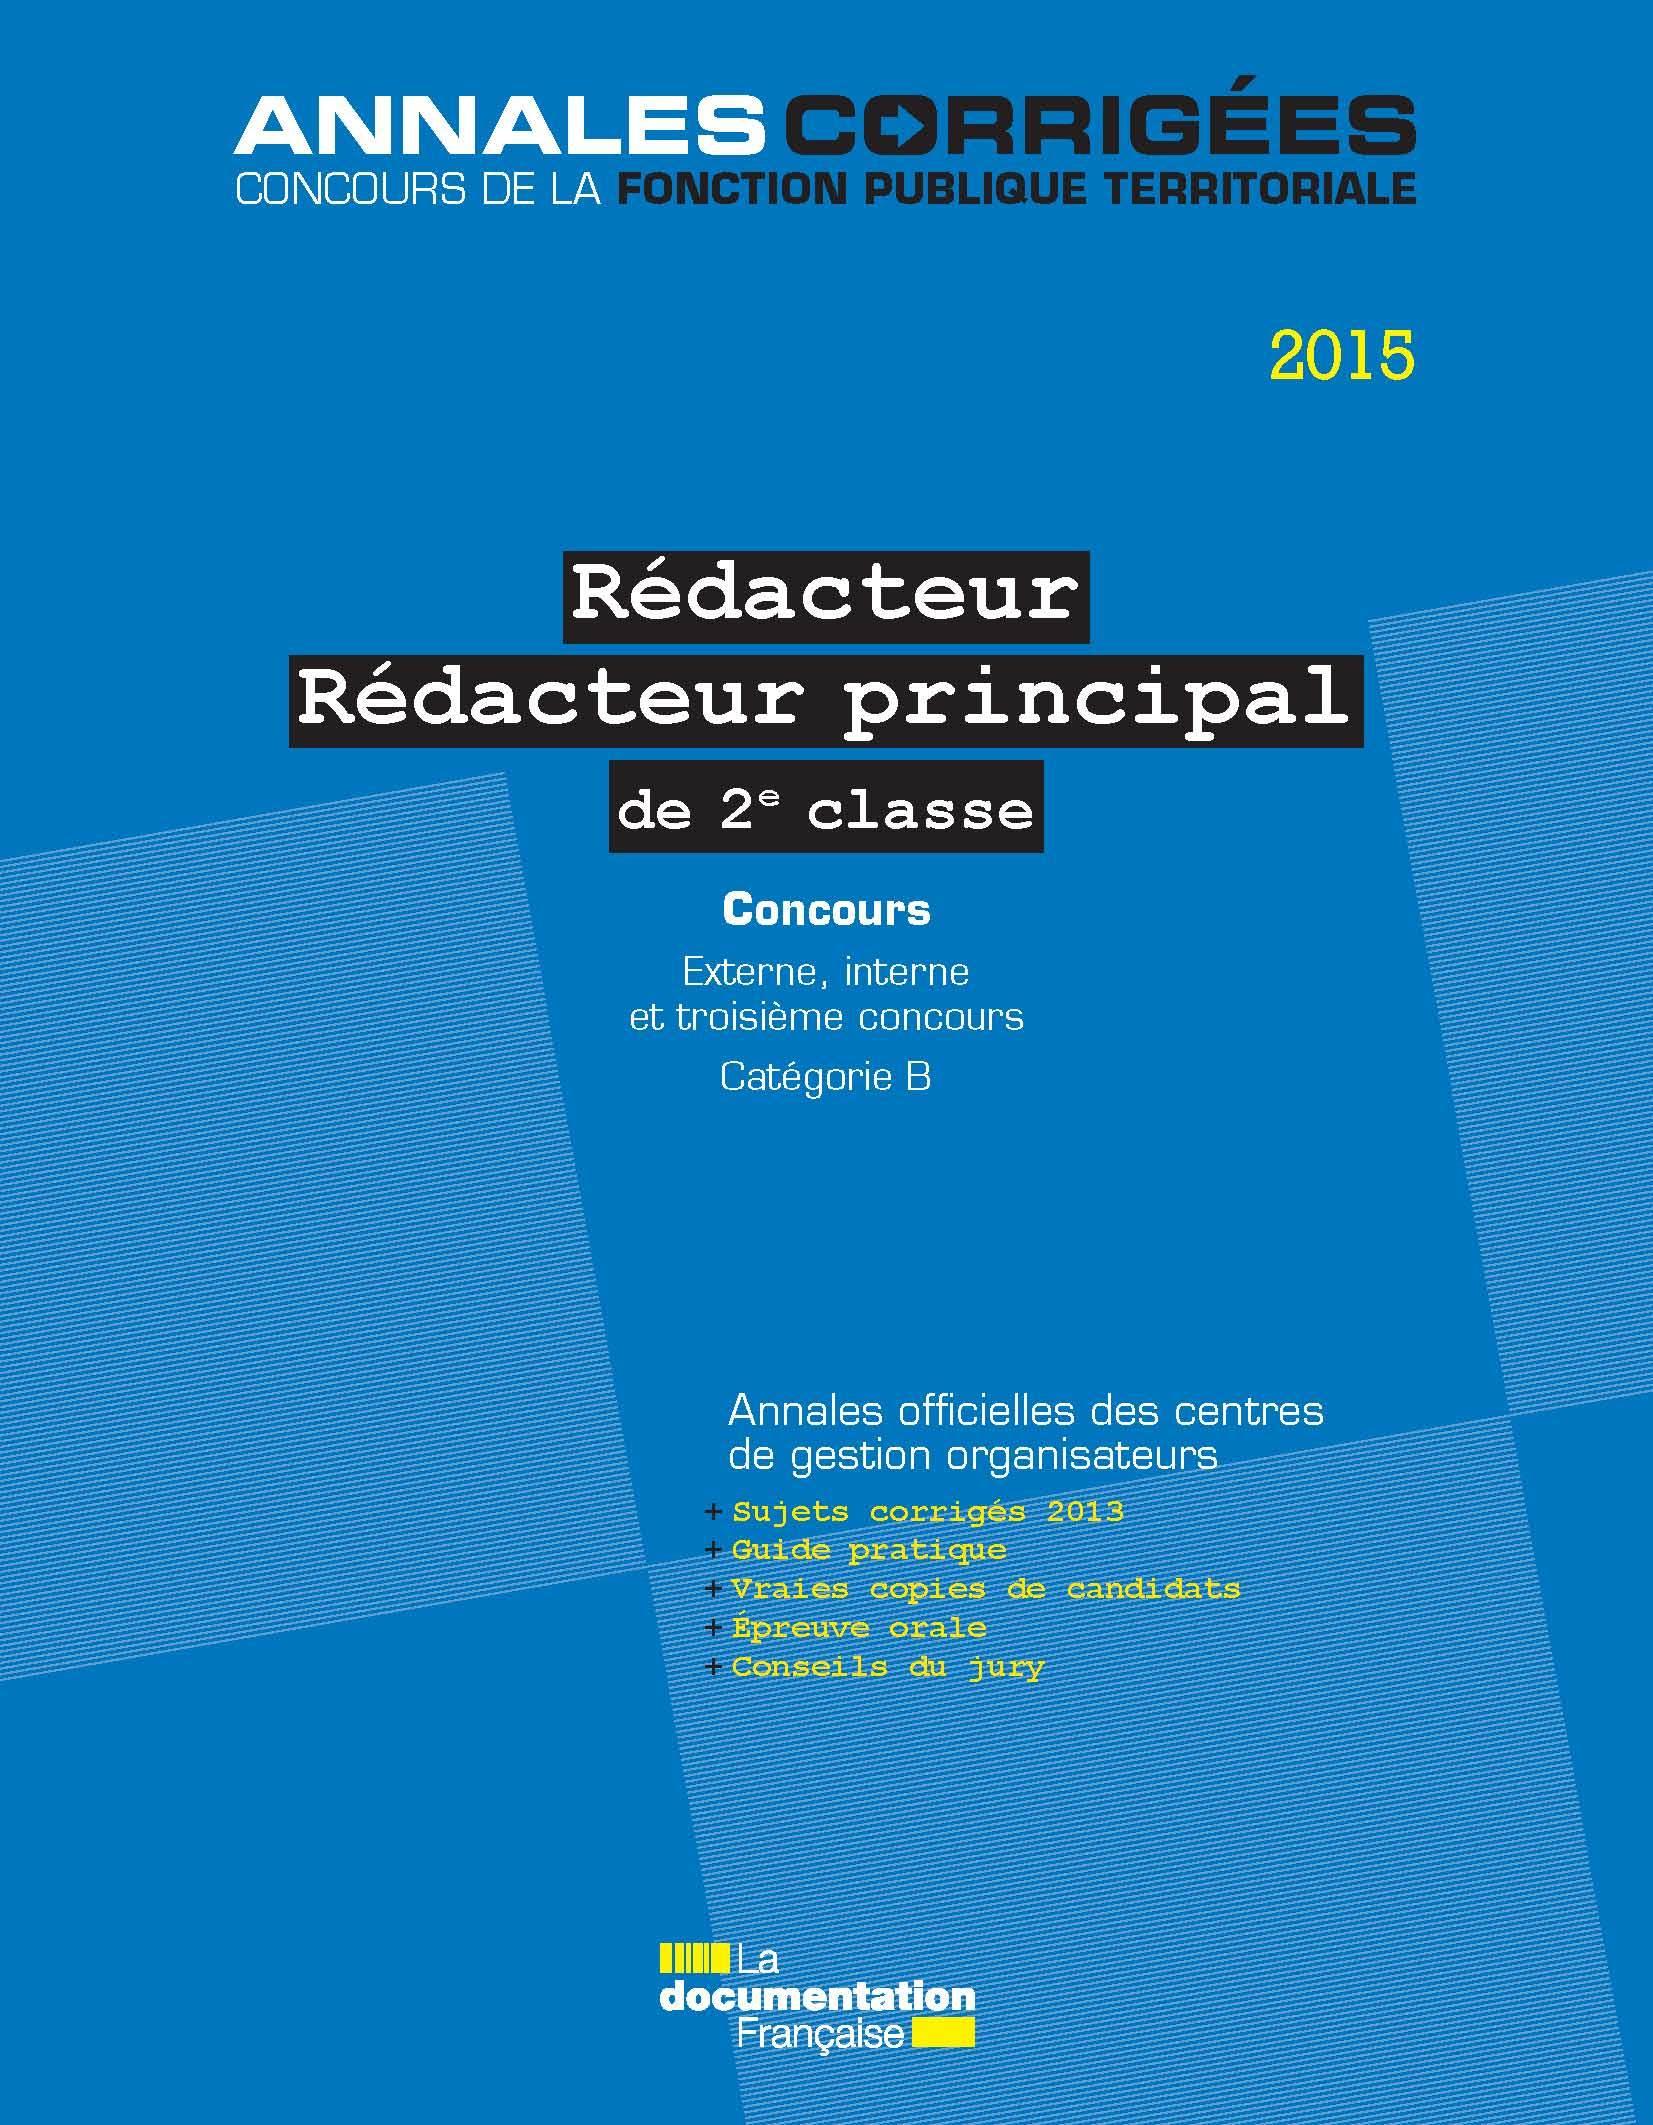 REDACTEUR, REDACTEUR PRINCIPAL DE 2E CLASSE 2015 CATEGORIE B